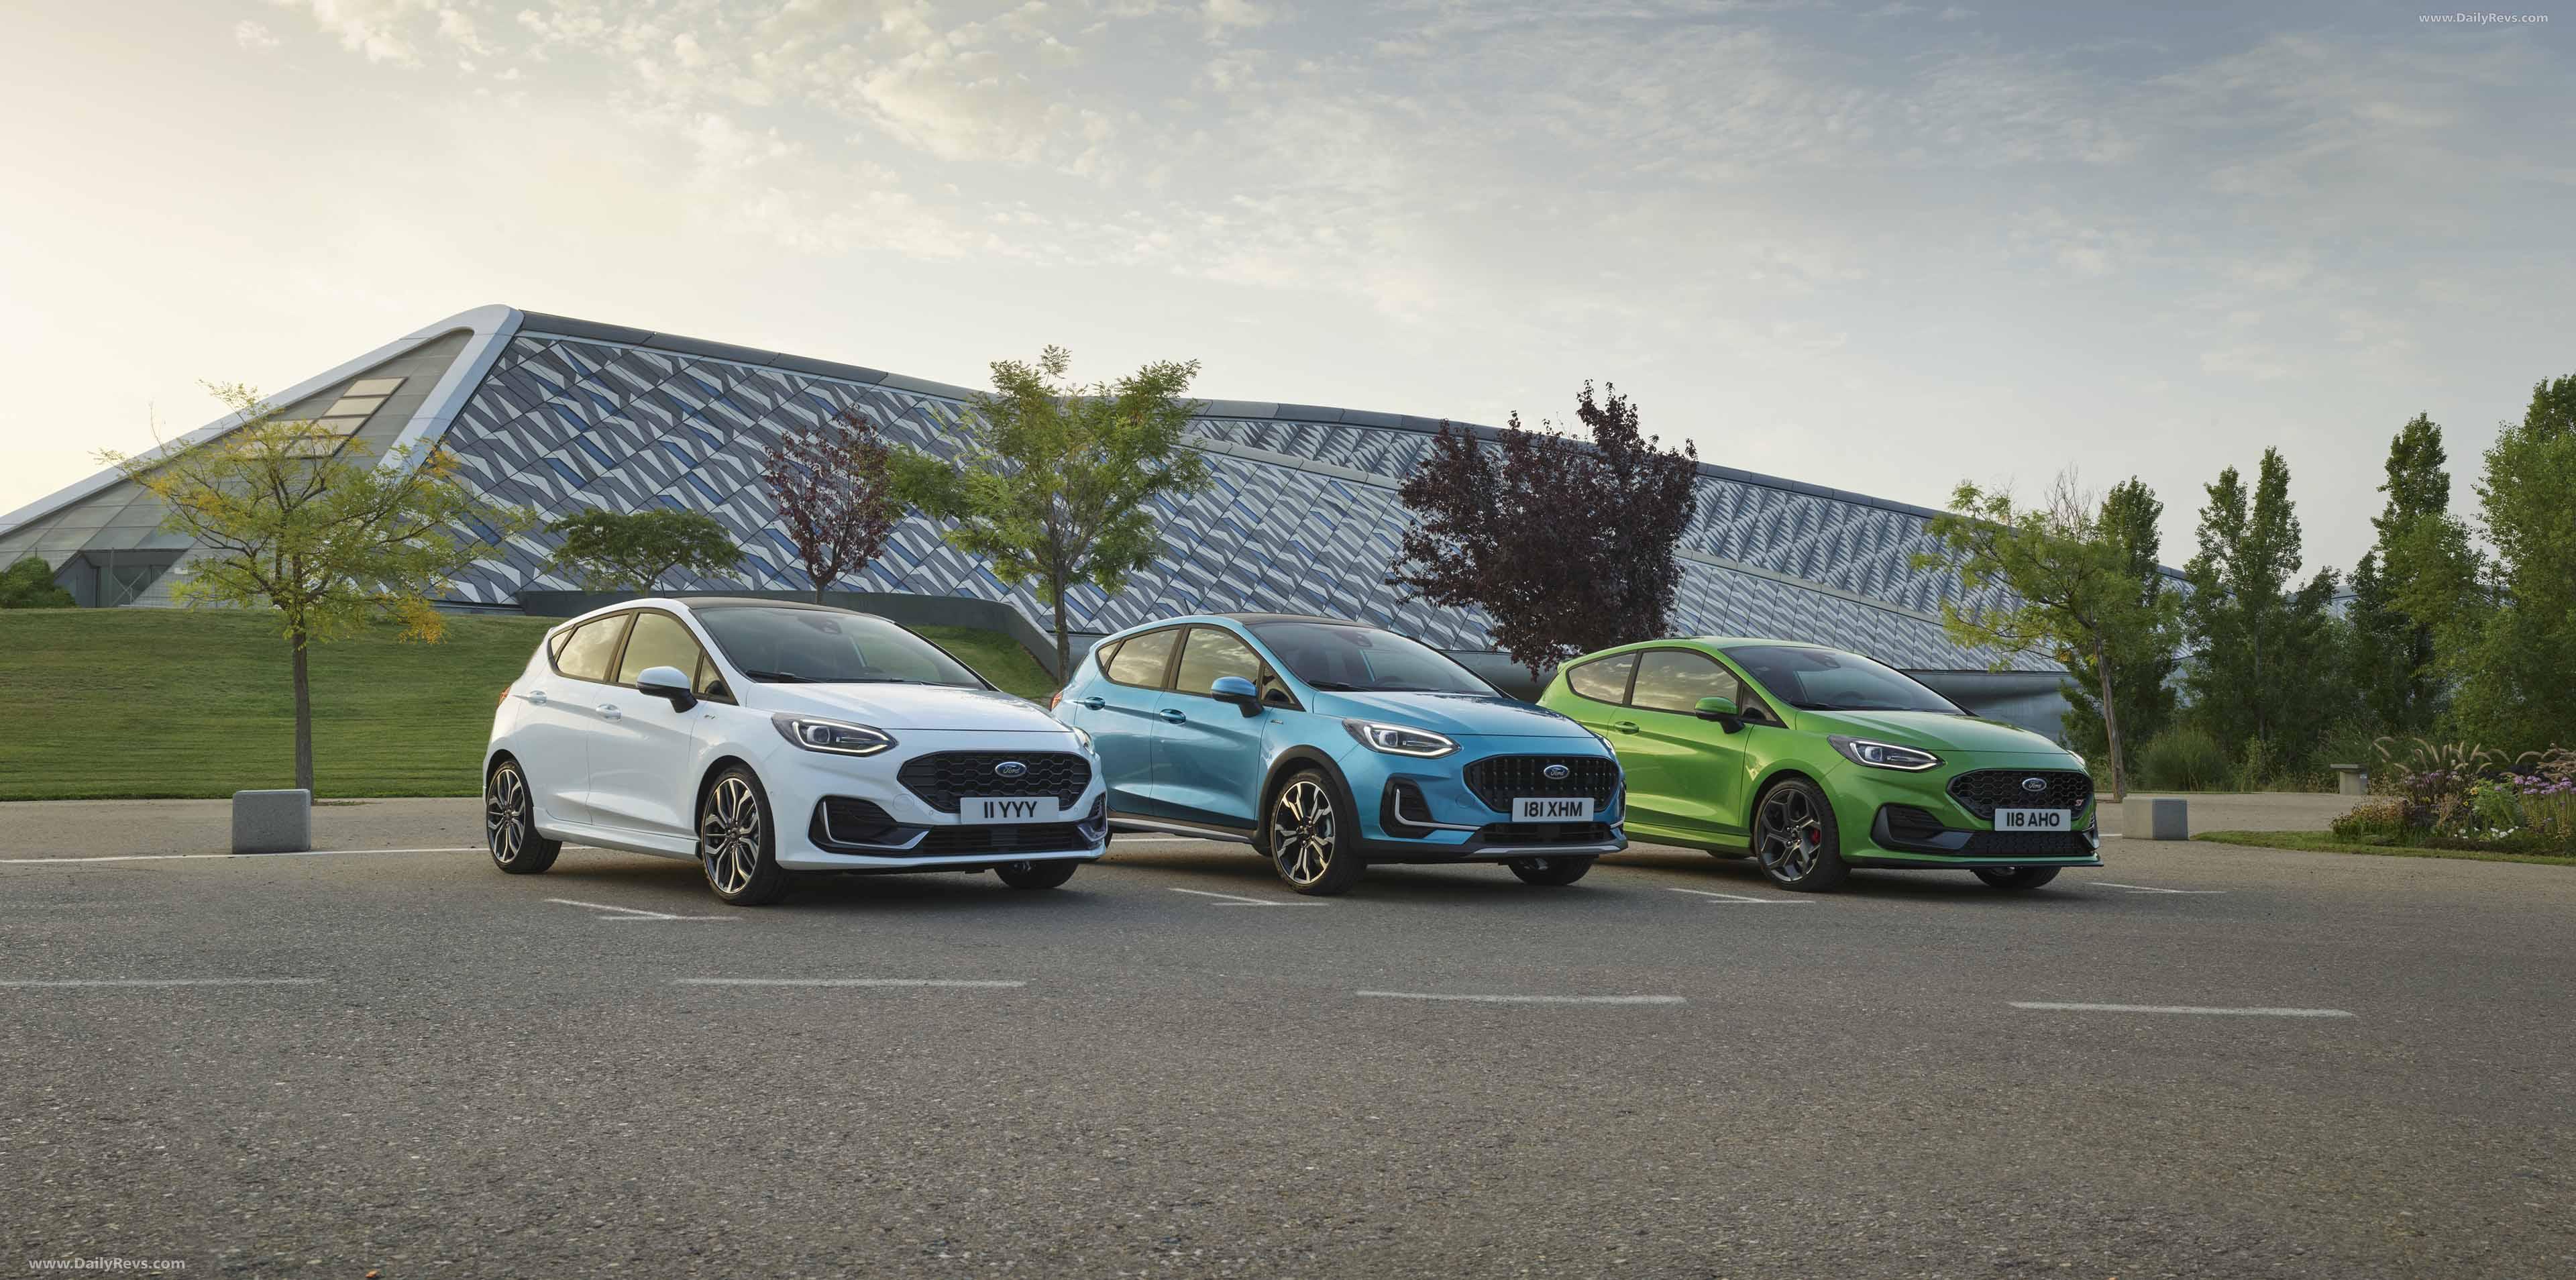 2022 Ford Fiesta full